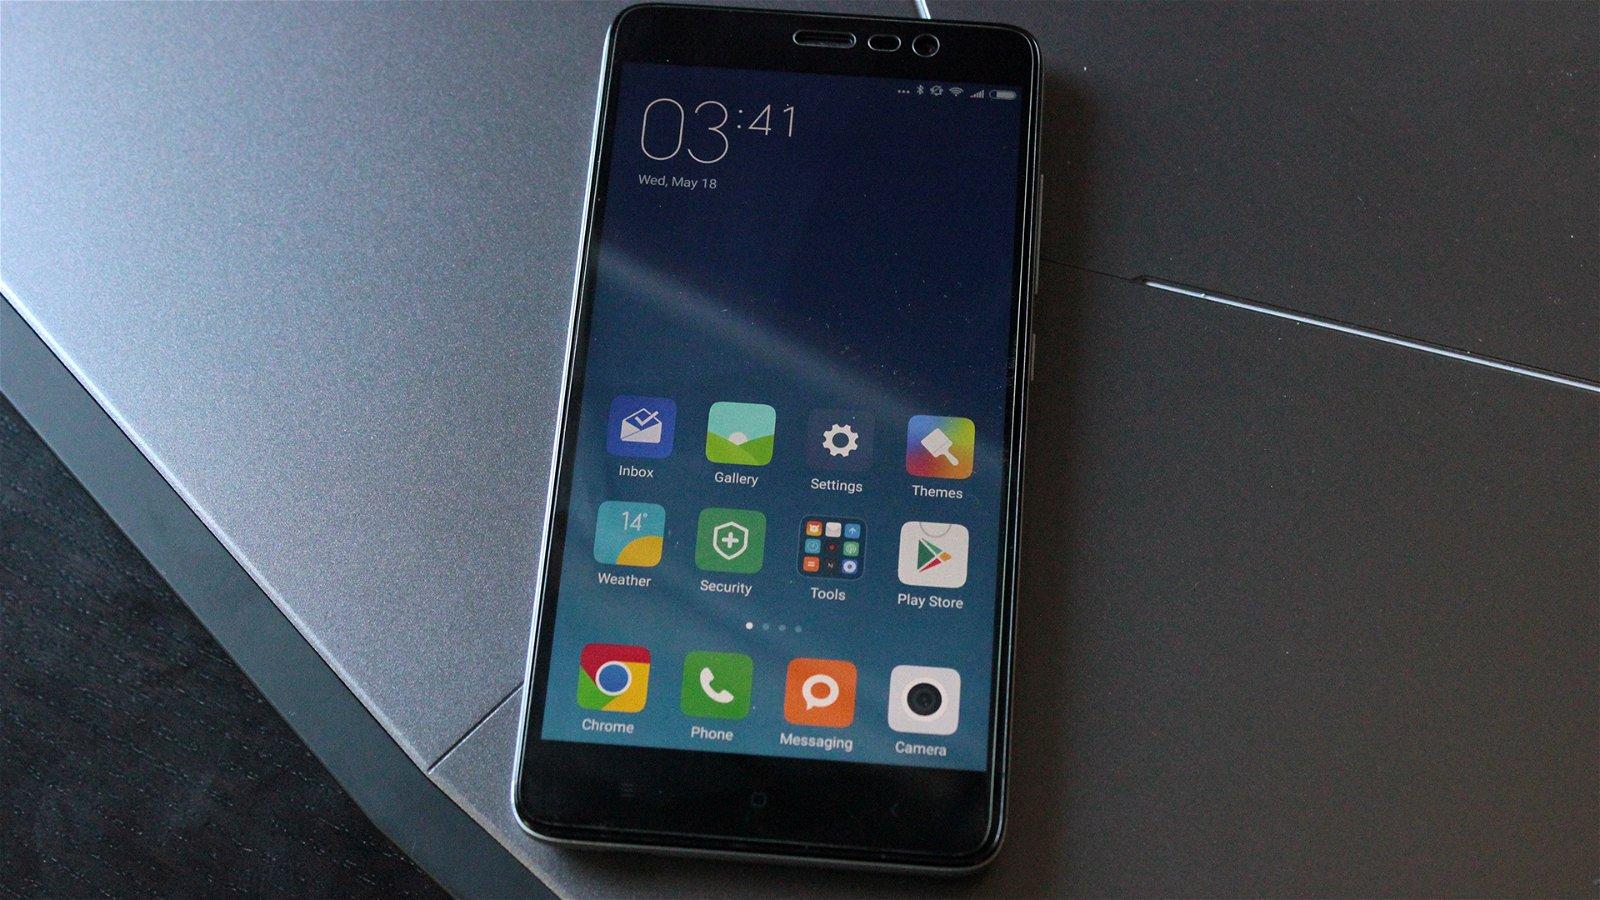 xiaomi redmi note 3 pro hardware review 3